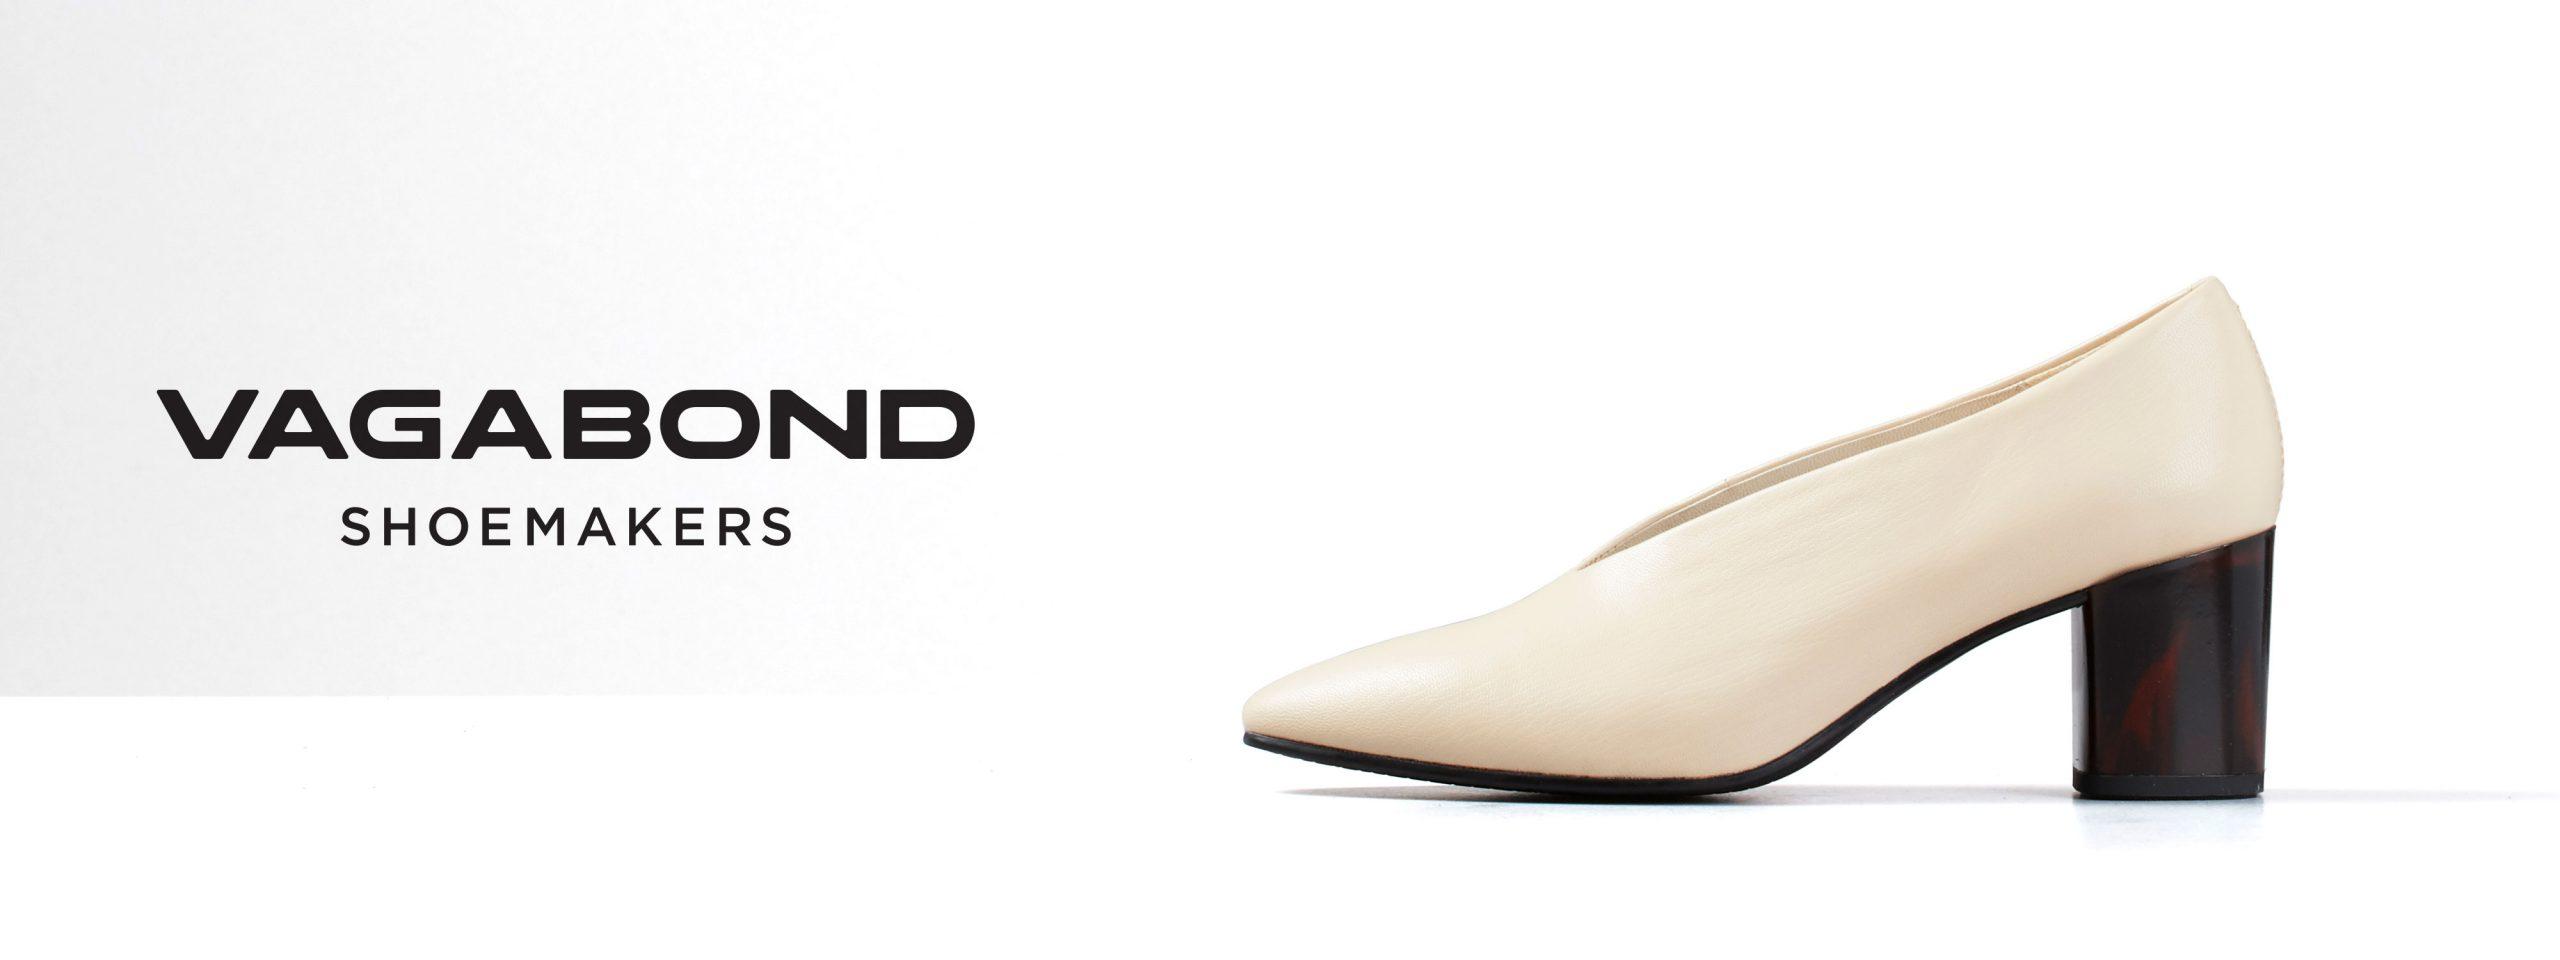 Vegabond Shoemakers Pump